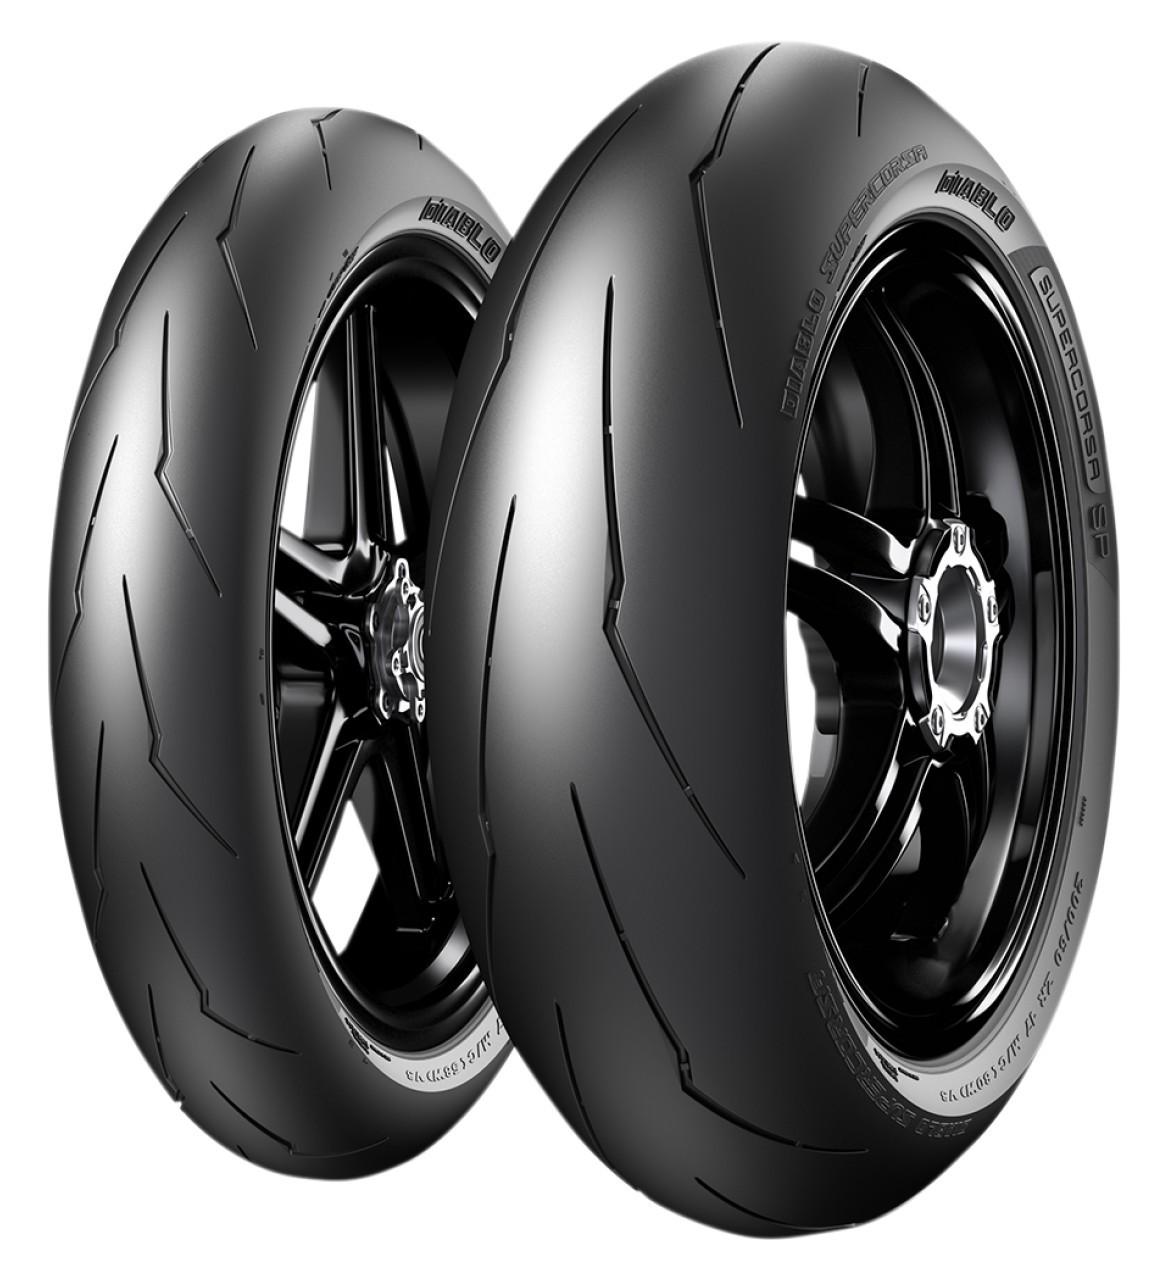 pirelli diablo supercorsa sp v3 tires 31 off revzilla. Black Bedroom Furniture Sets. Home Design Ideas